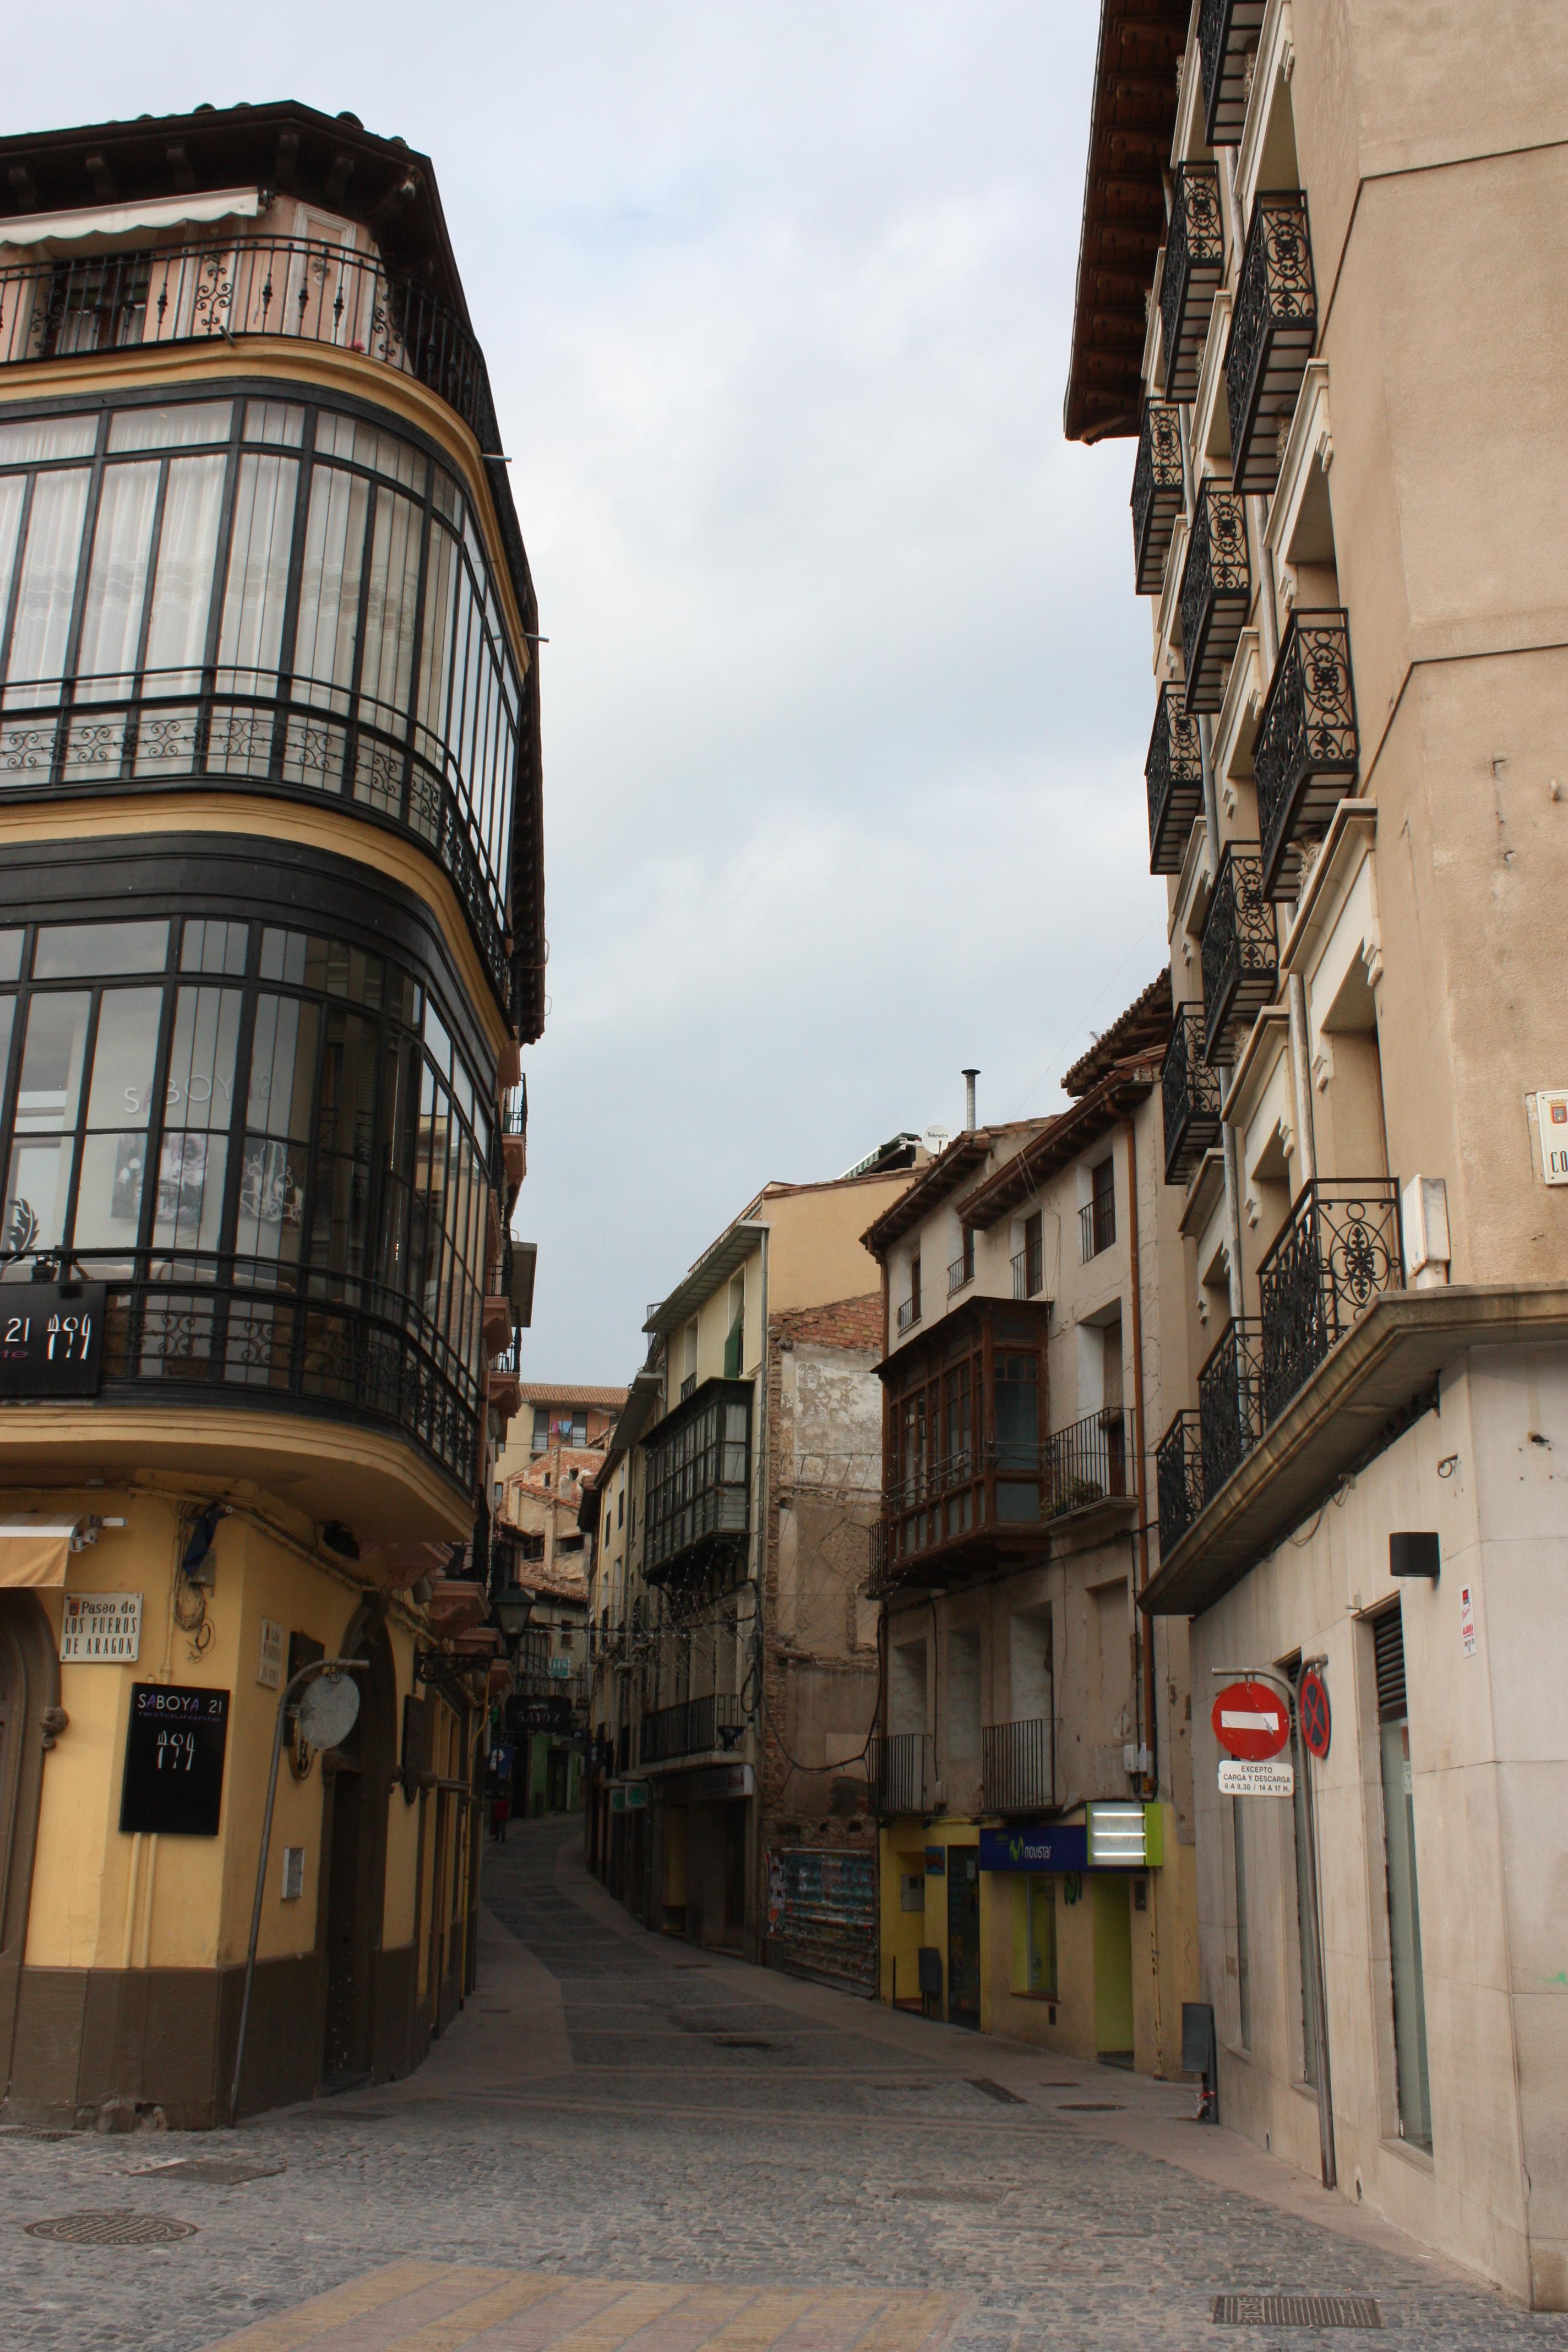 Calles con historia blog de tarazona monumental for Oficina turismo tarazona